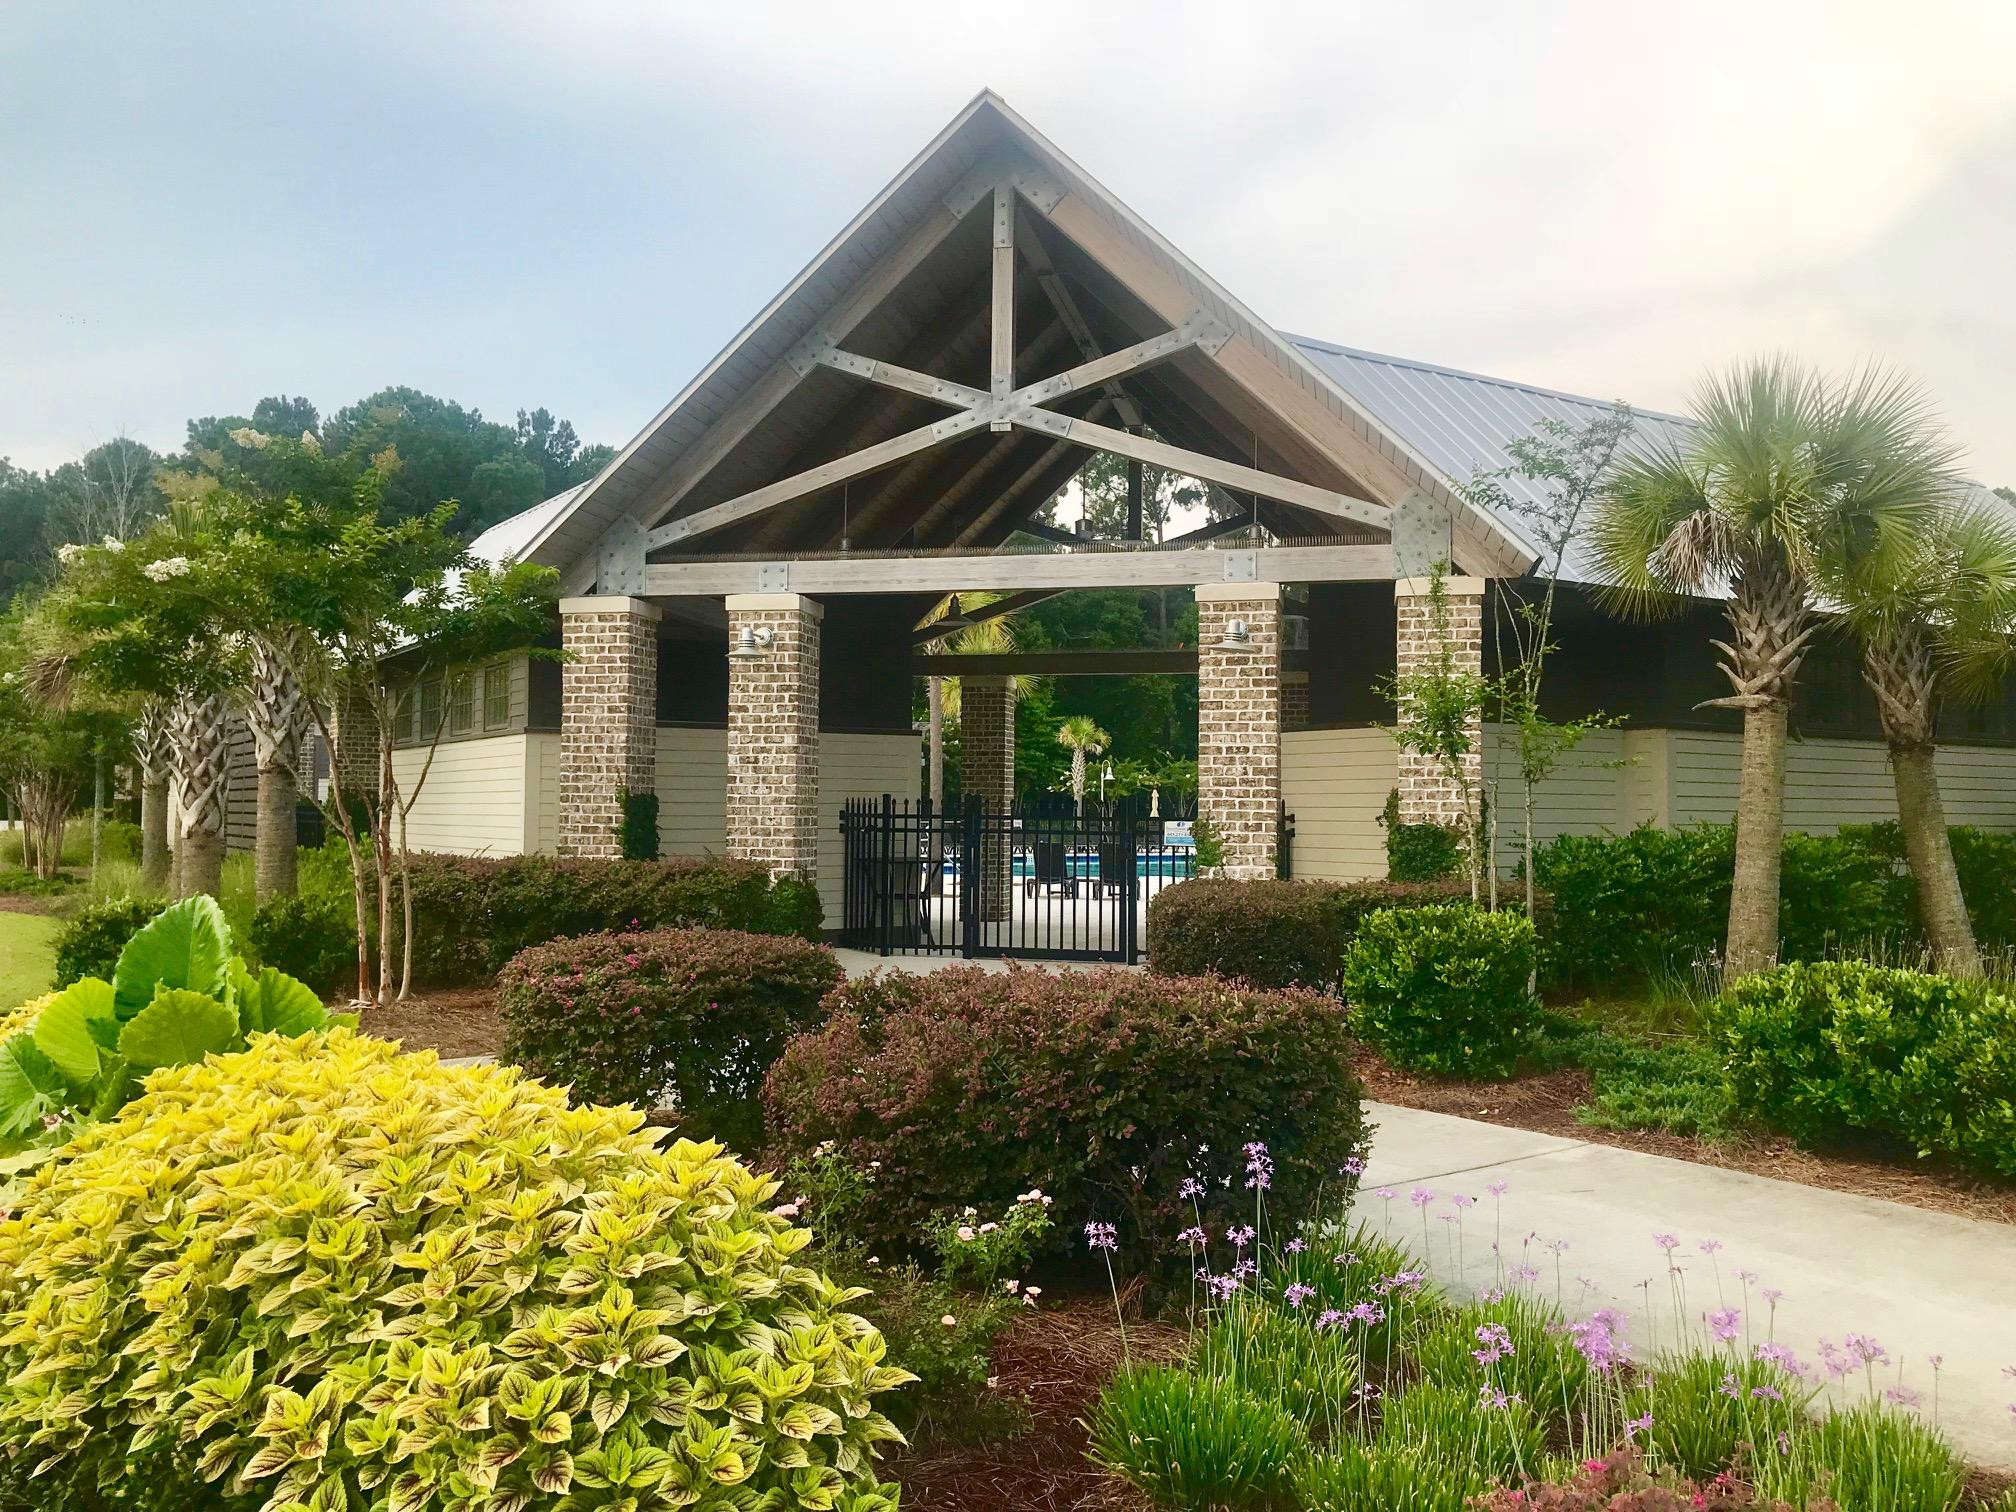 Carolina Park Homes For Sale - 3672 Shutesbury, Mount Pleasant, SC - 2